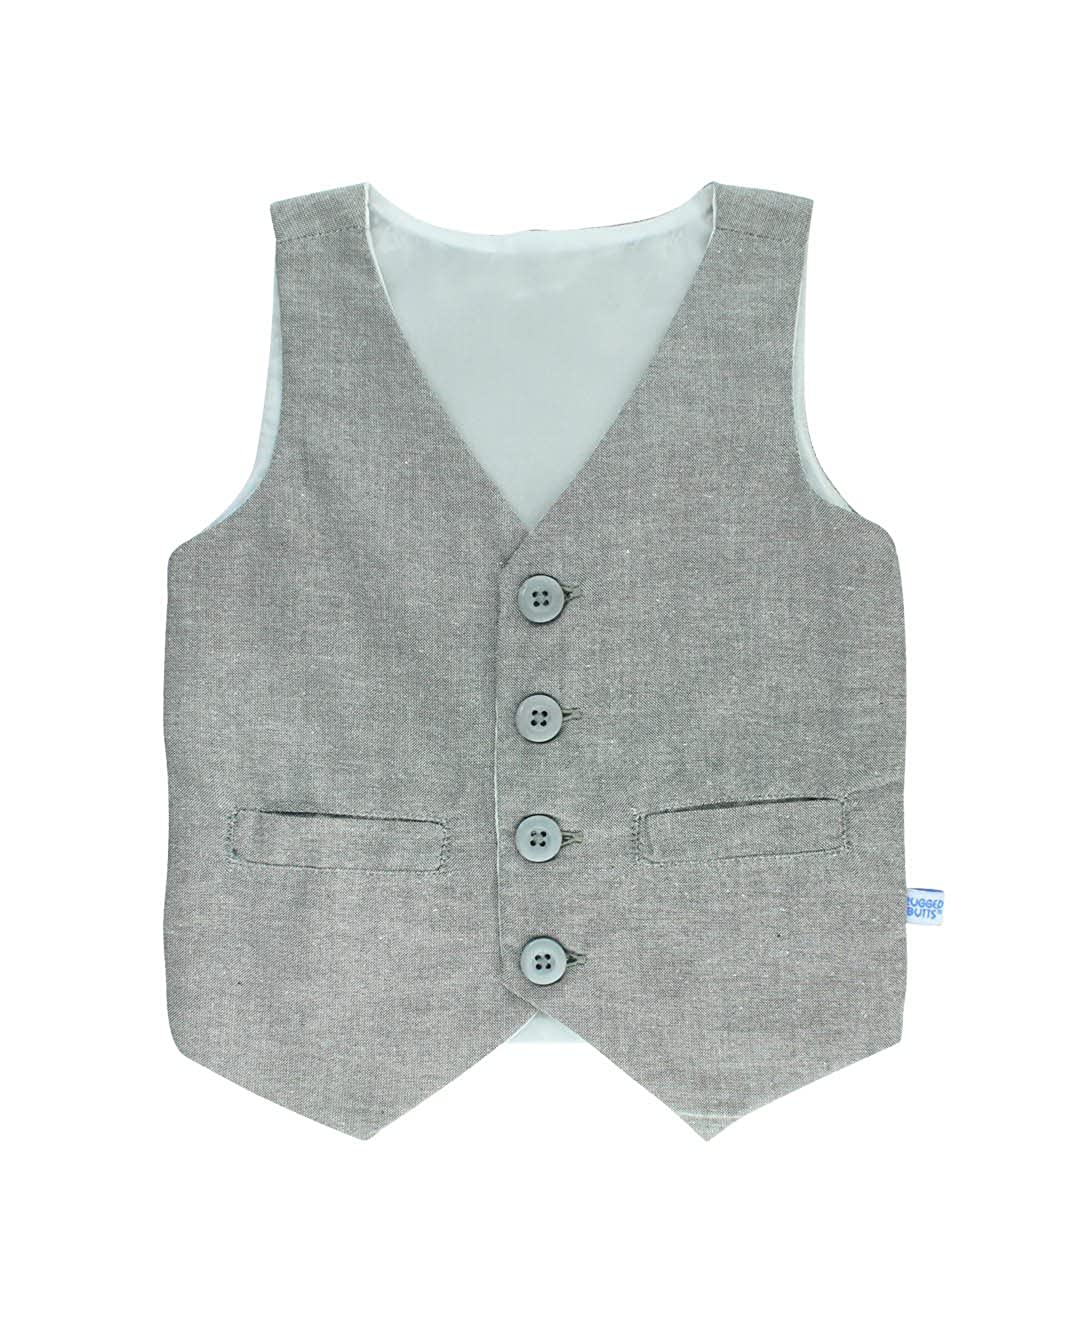 RuggedButts Infant/Toddler Boys Gray Chambray Vest BVWGYXX-CH00-BABY